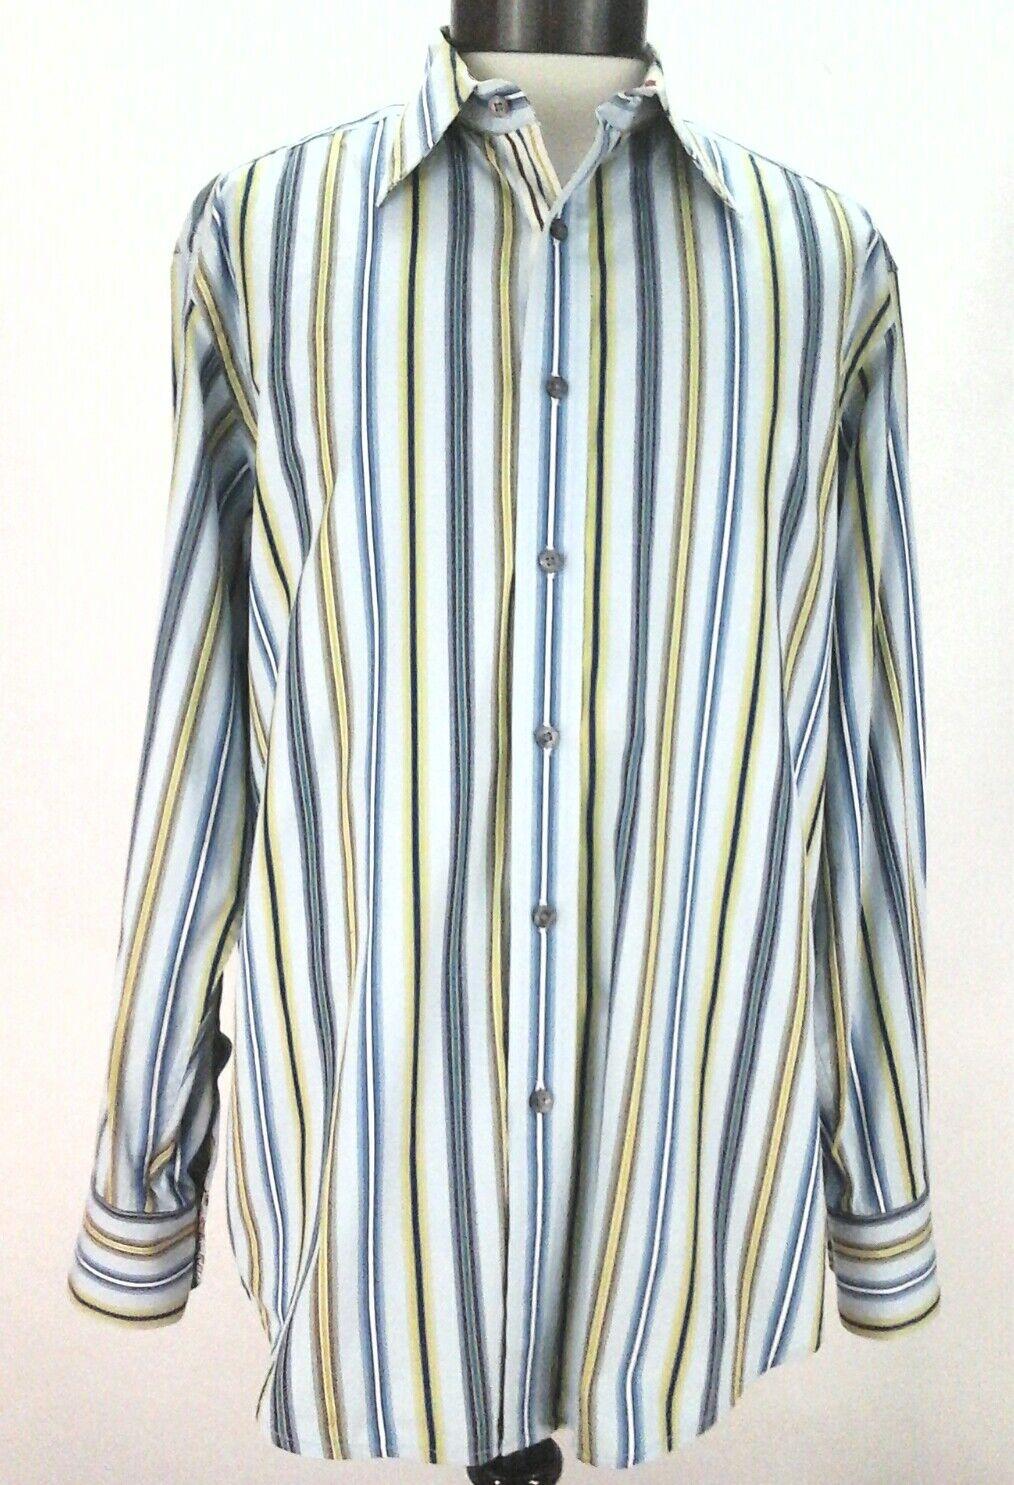 cf3cbd1c730b2 Details about ROBERT GRAHAM Shirt STRIPED Flip Cuff KEEP SMILING Blue  Button Down Men's L $198